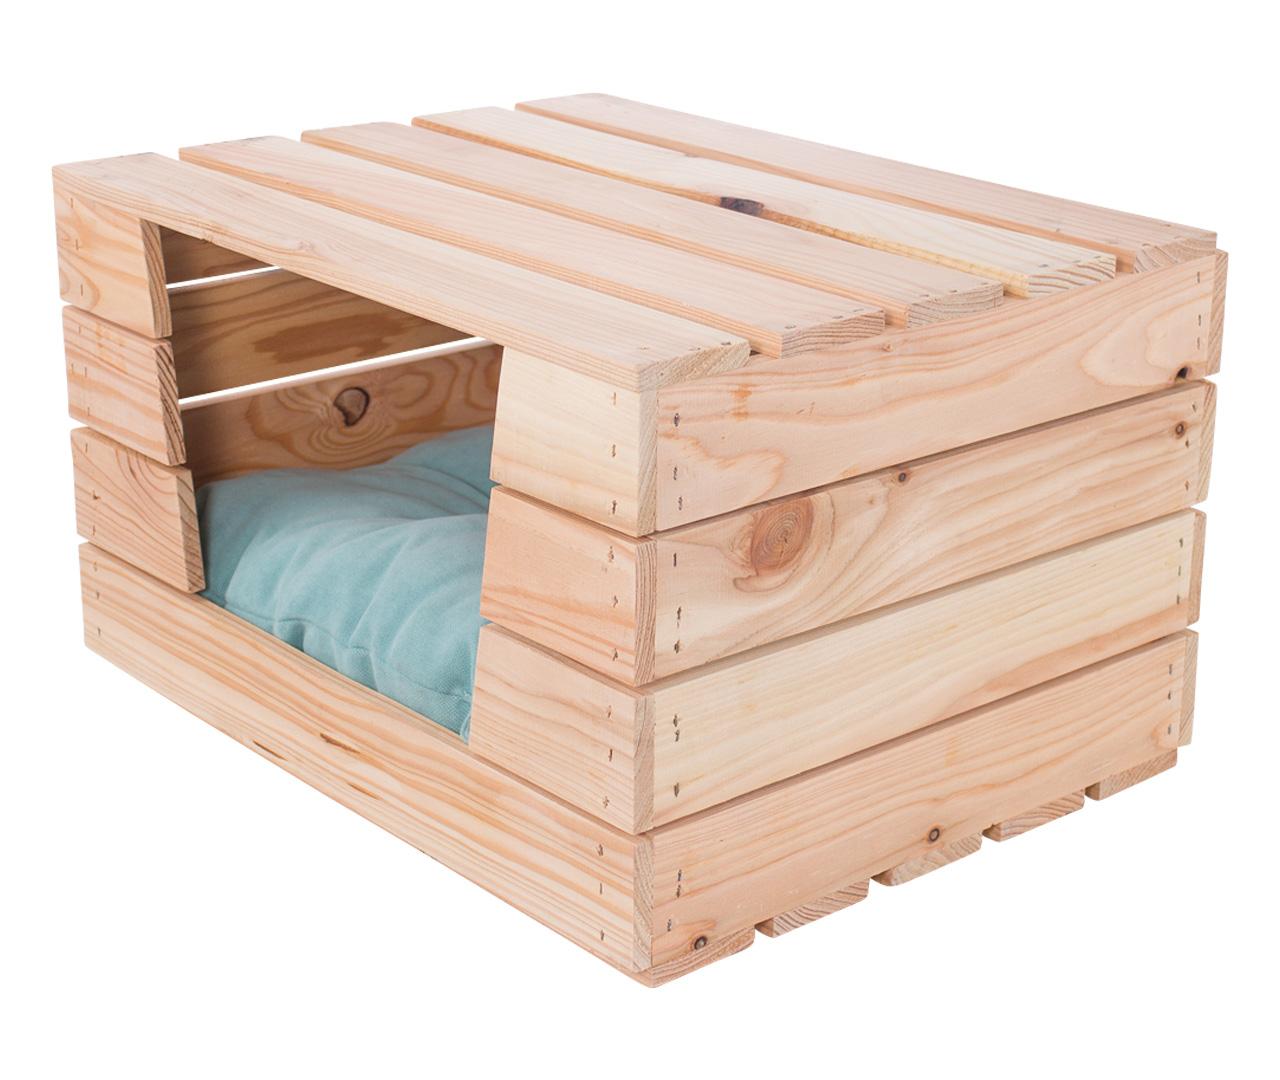 Hundebett in hellen Holz mit Kissen